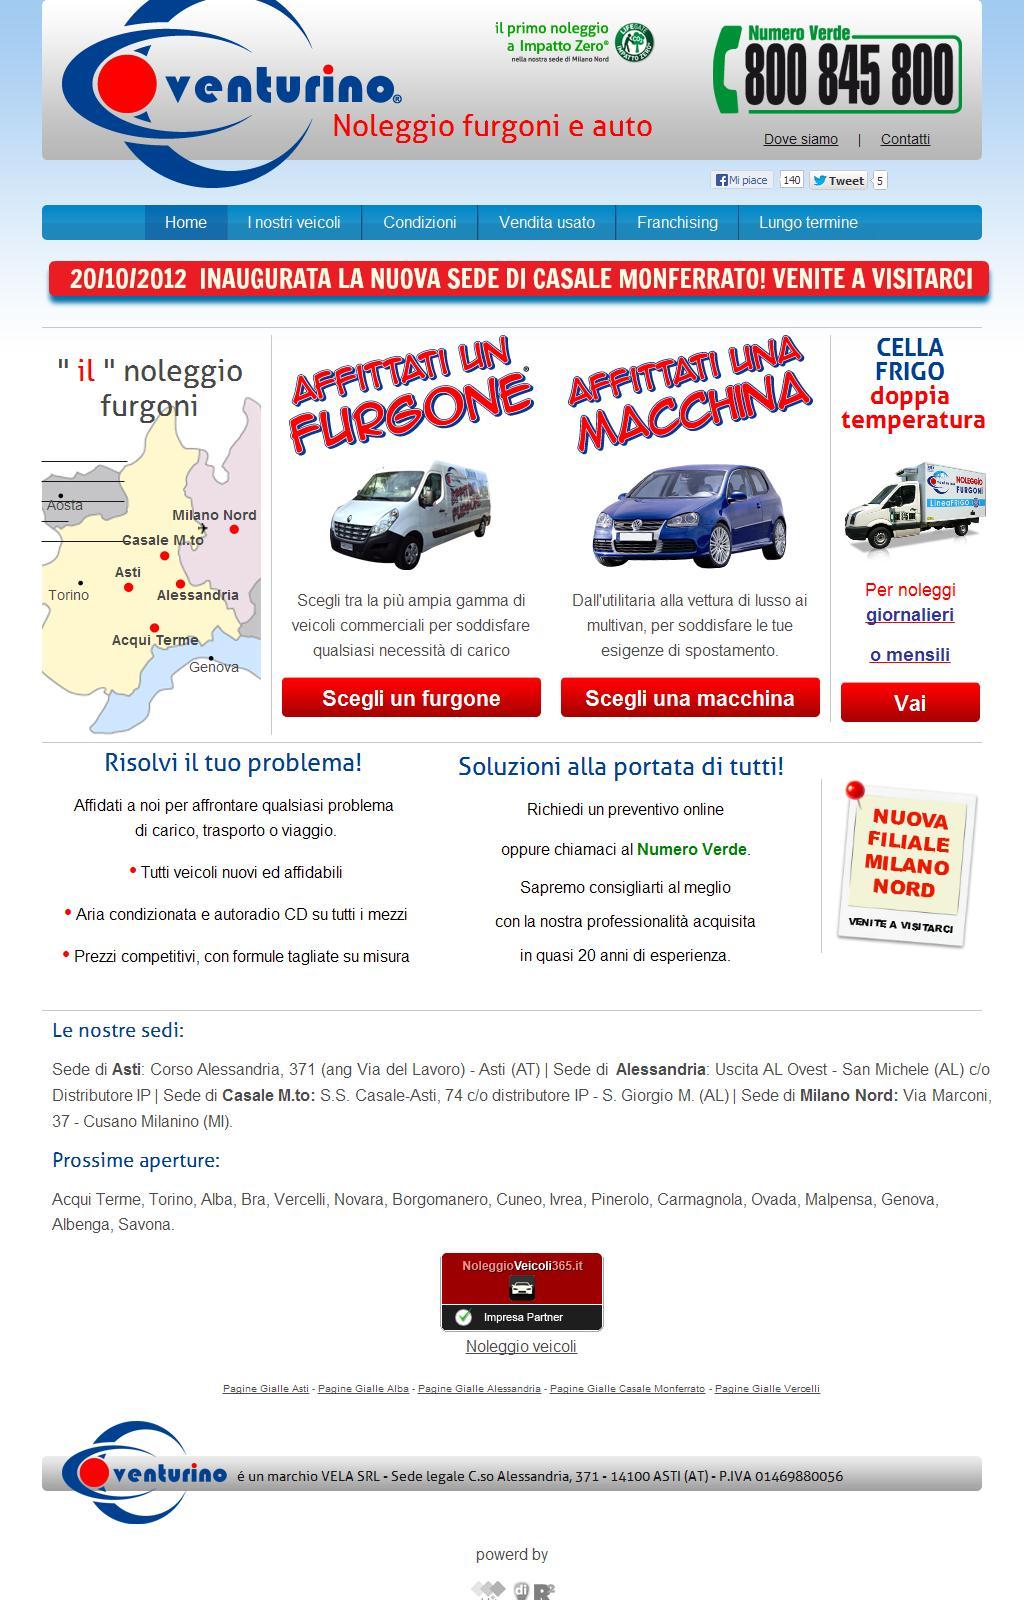 Noleggio furgoni e macchine Venturino - Affittati un furgone